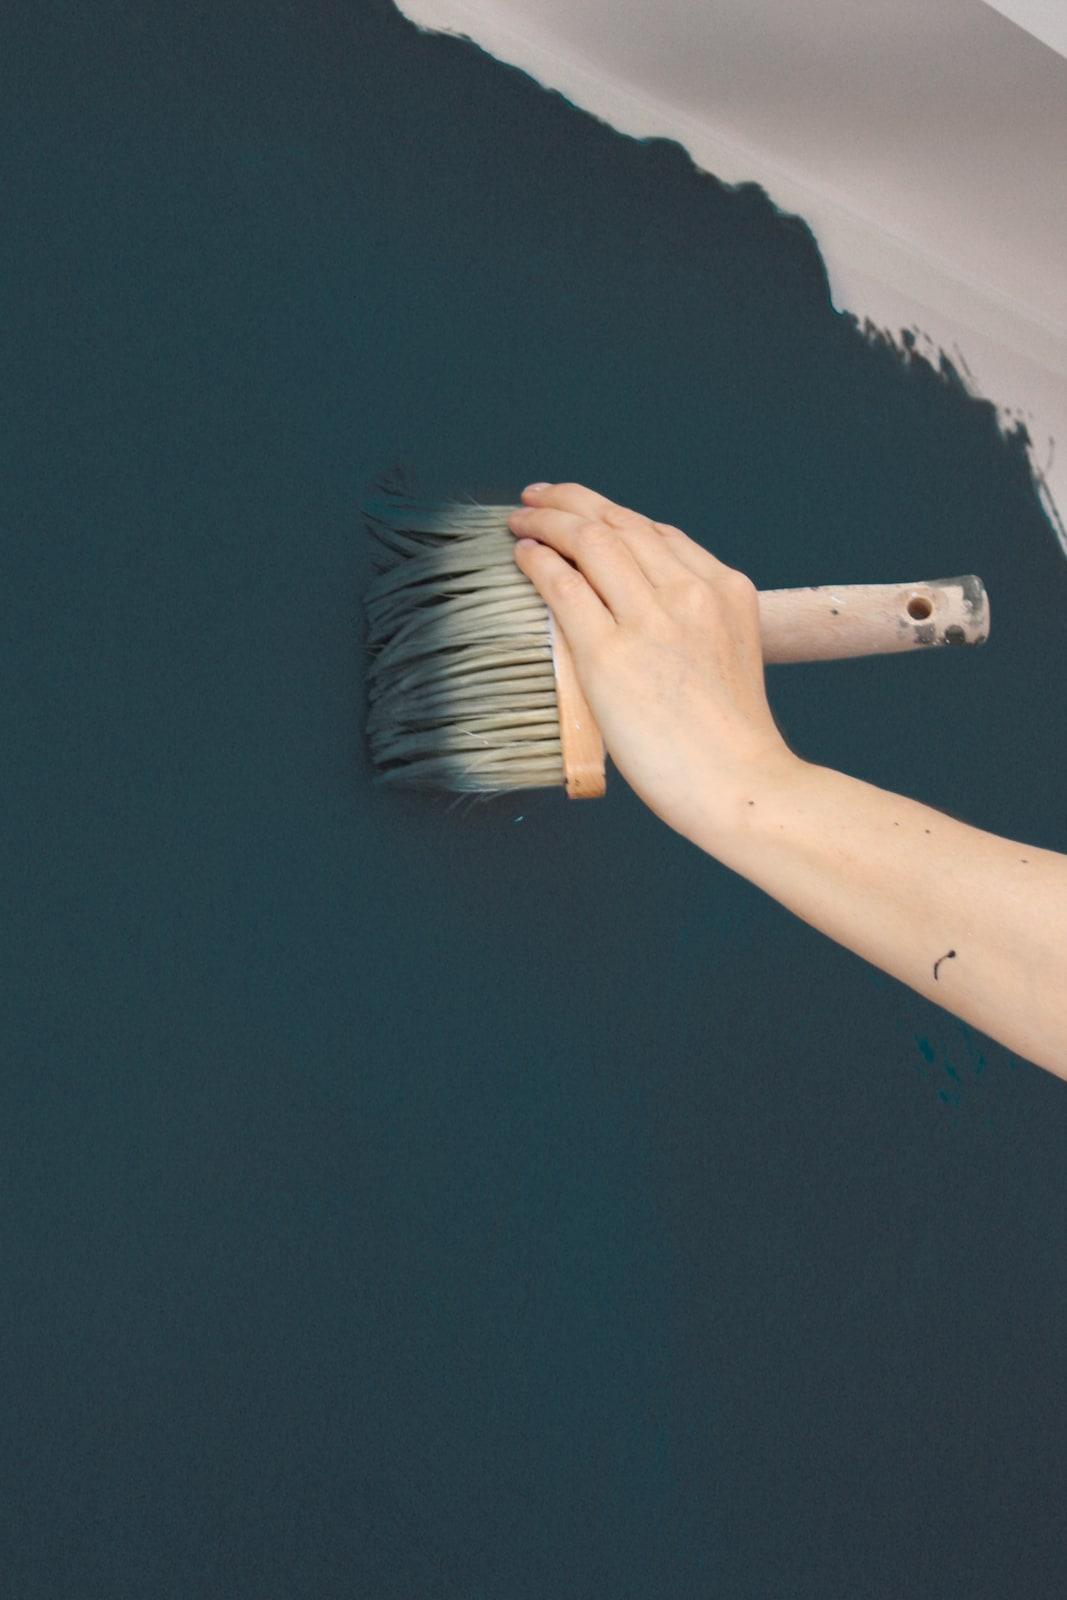 zementfliesen-terrazzofliesen-kreidefarbe-Indigo-terrazzo-fugenlos-viaplatten-streichen | Kreidefarbe Indigo 60 ml